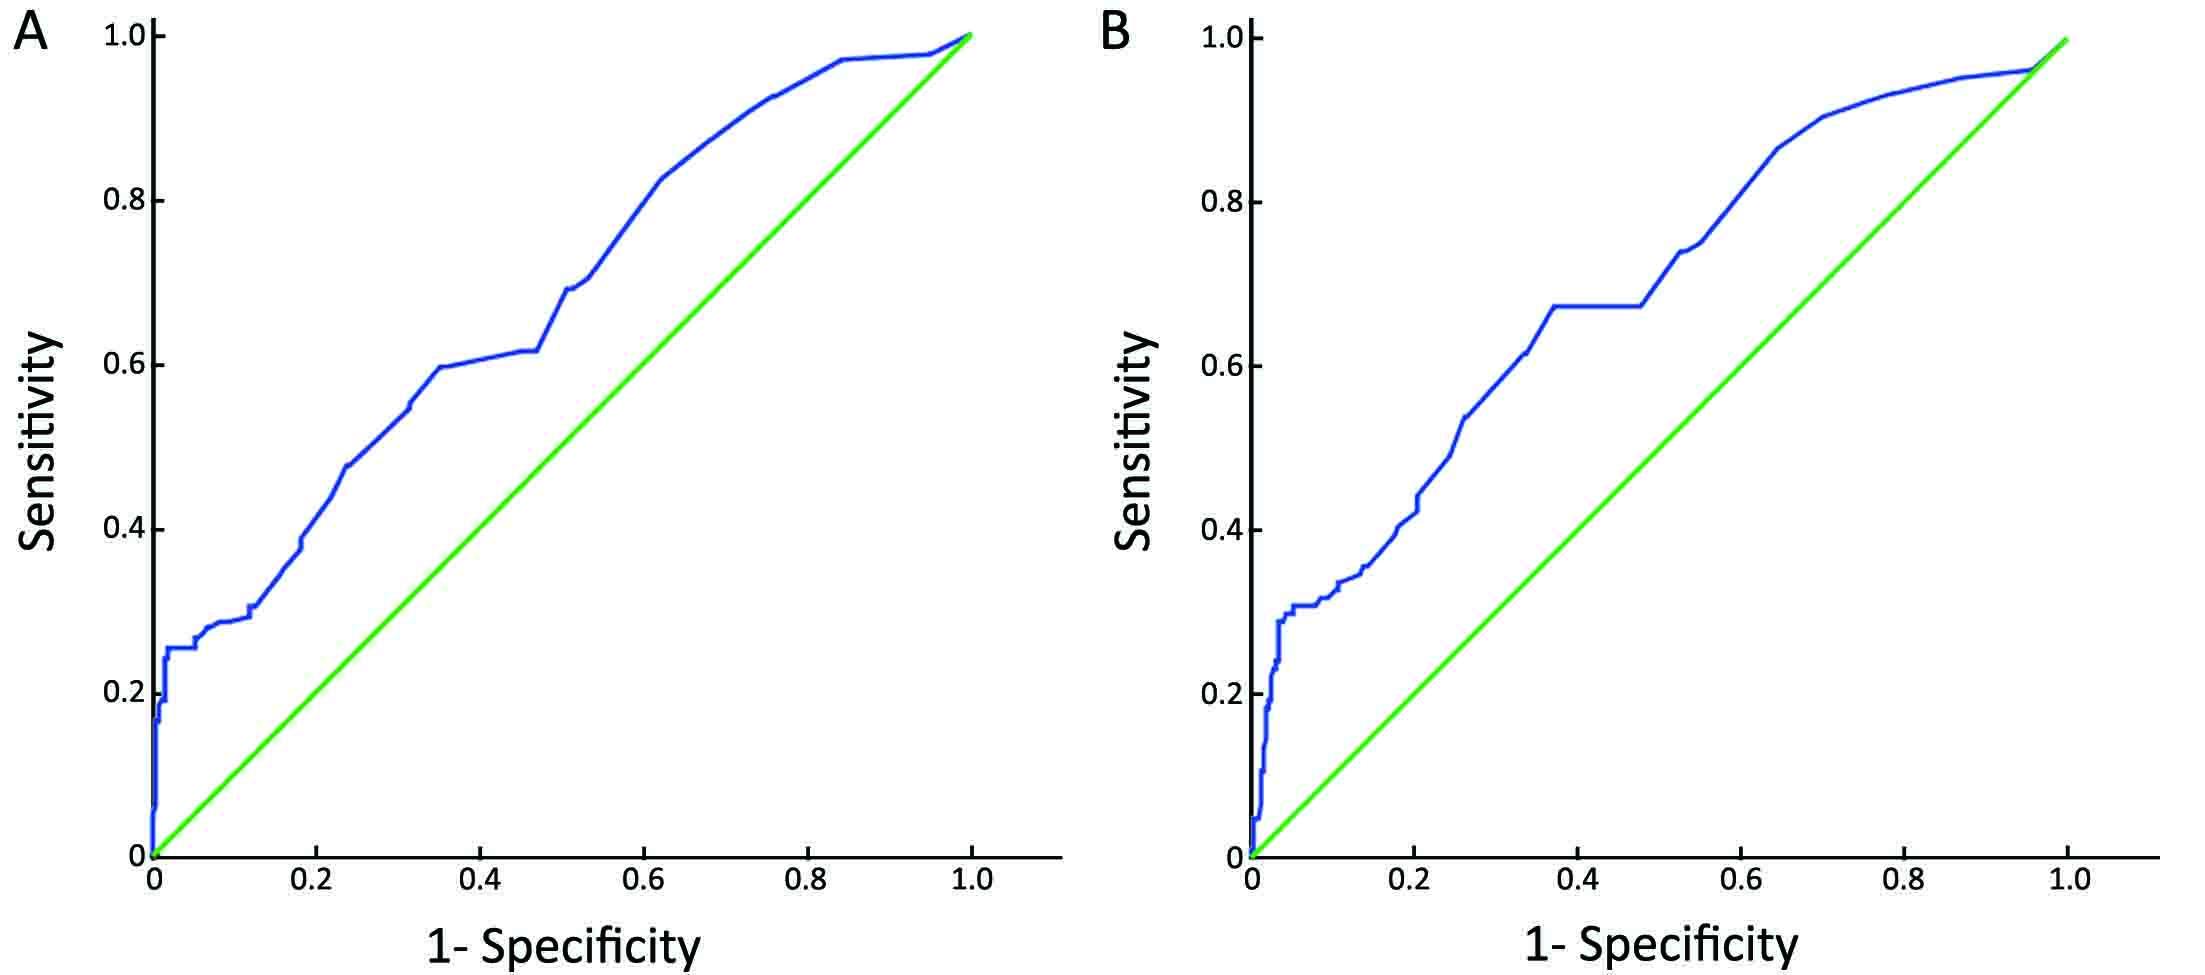 Serum LDH level may predict outcome of chronic lymphocytic leukemia